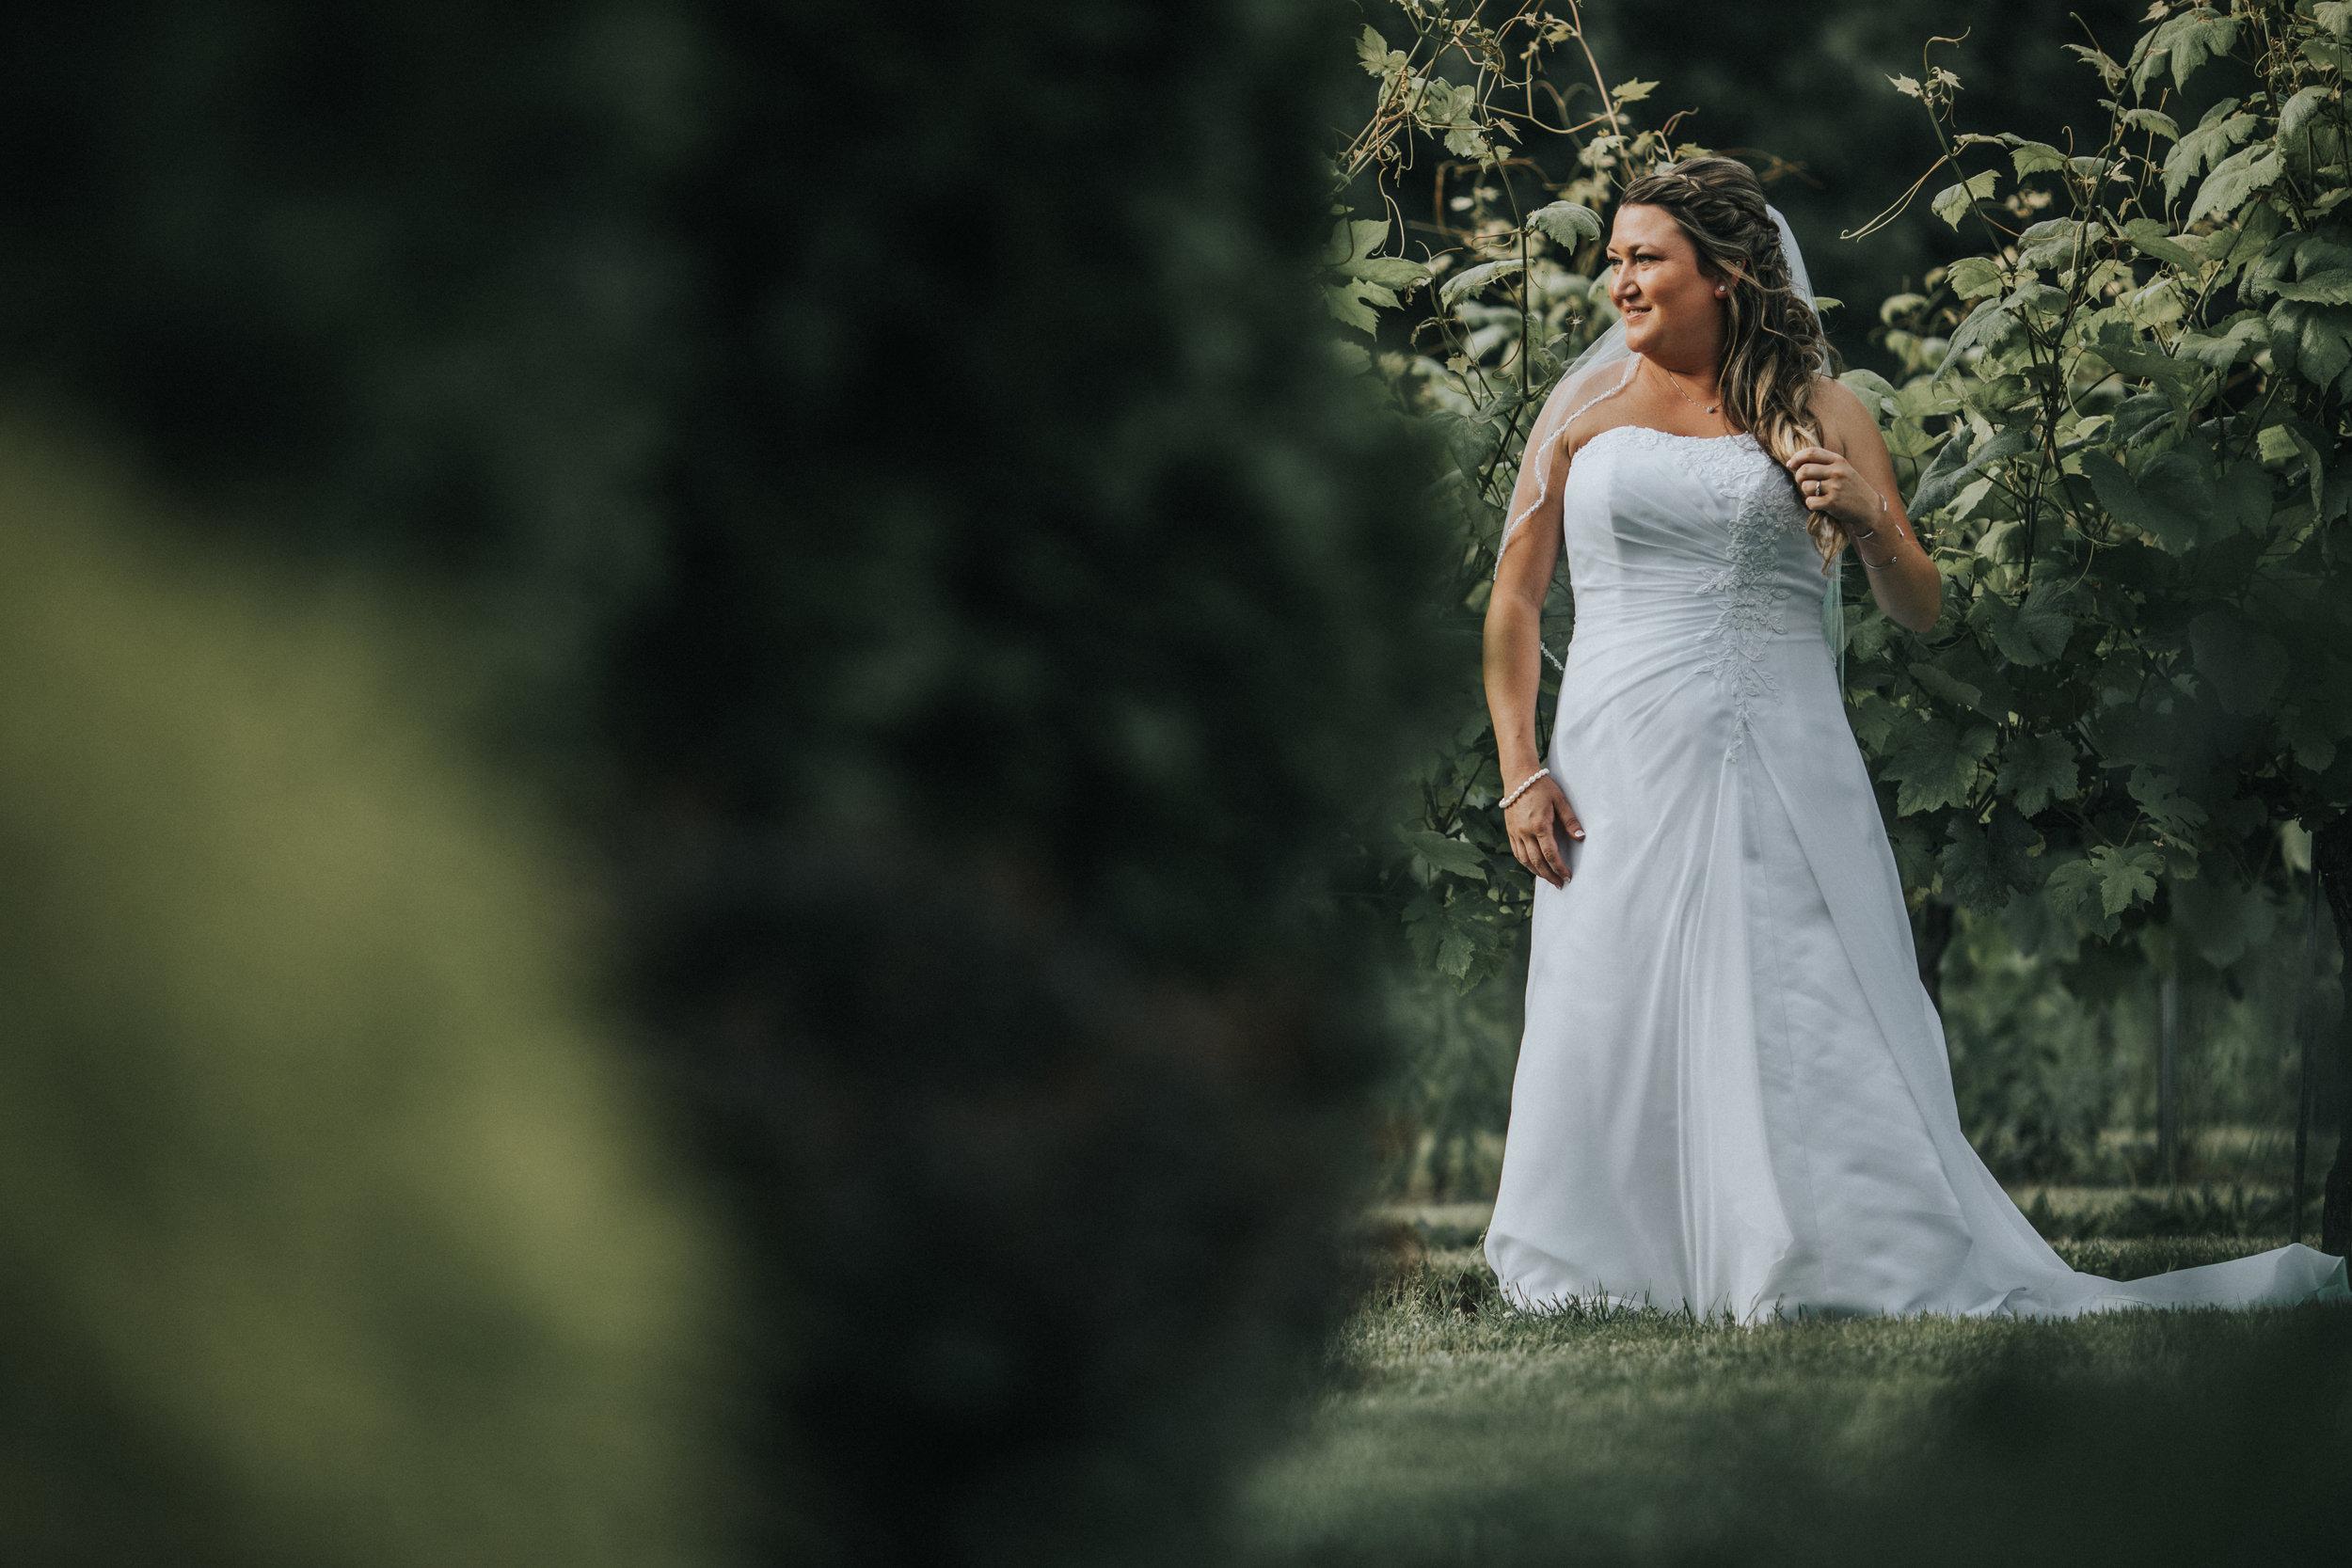 New-Jersey-Wedding-Photographer-JennaLynnPhotography-ValenzanoWinery-Bride&Groom-13.jpg